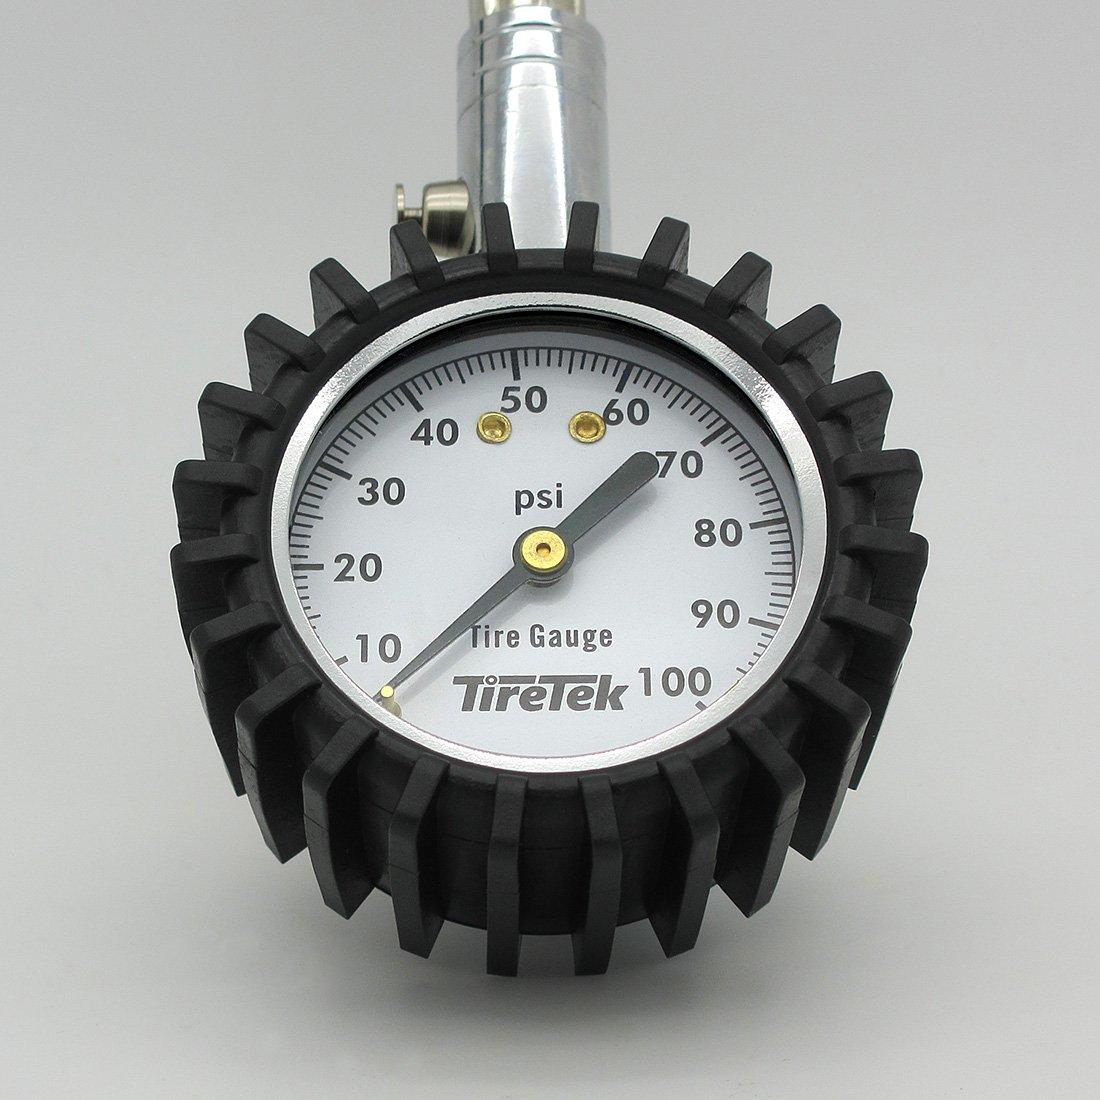 Heavy Duty Best for Car /& Motorcycle 0-100 PSI TT-GH01-QBR2-100 TireTek Flexi-Pro Tire Pressure Gauge